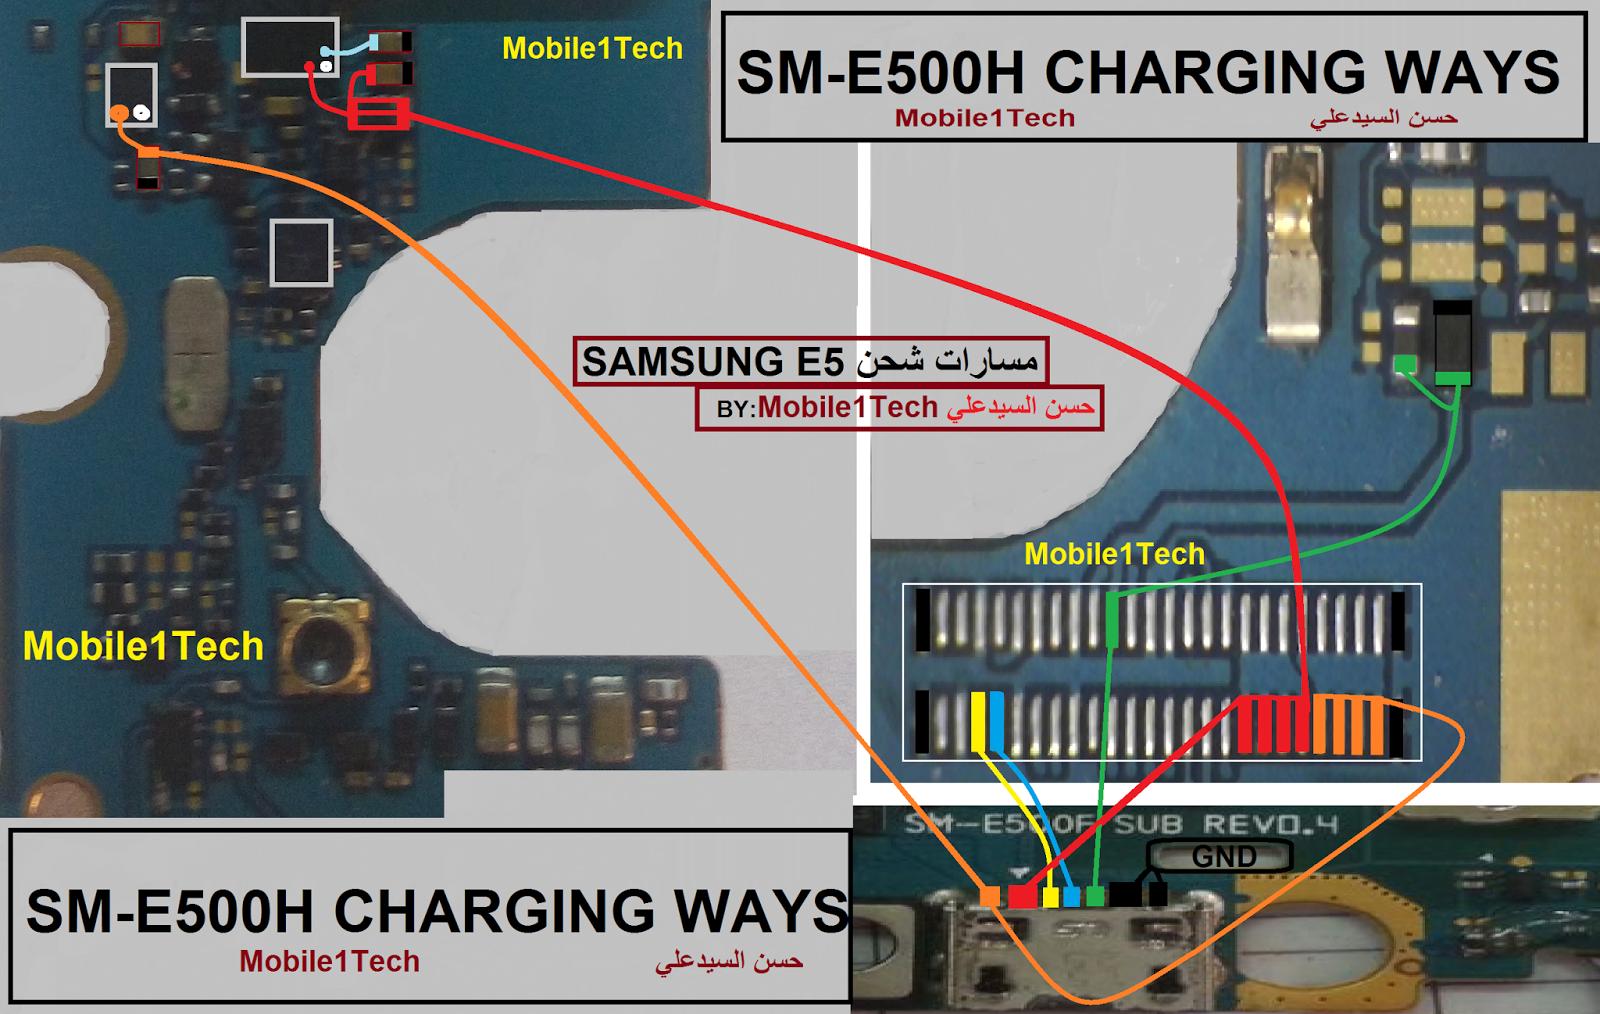 Mobile1Tech : سبتمبر 2016